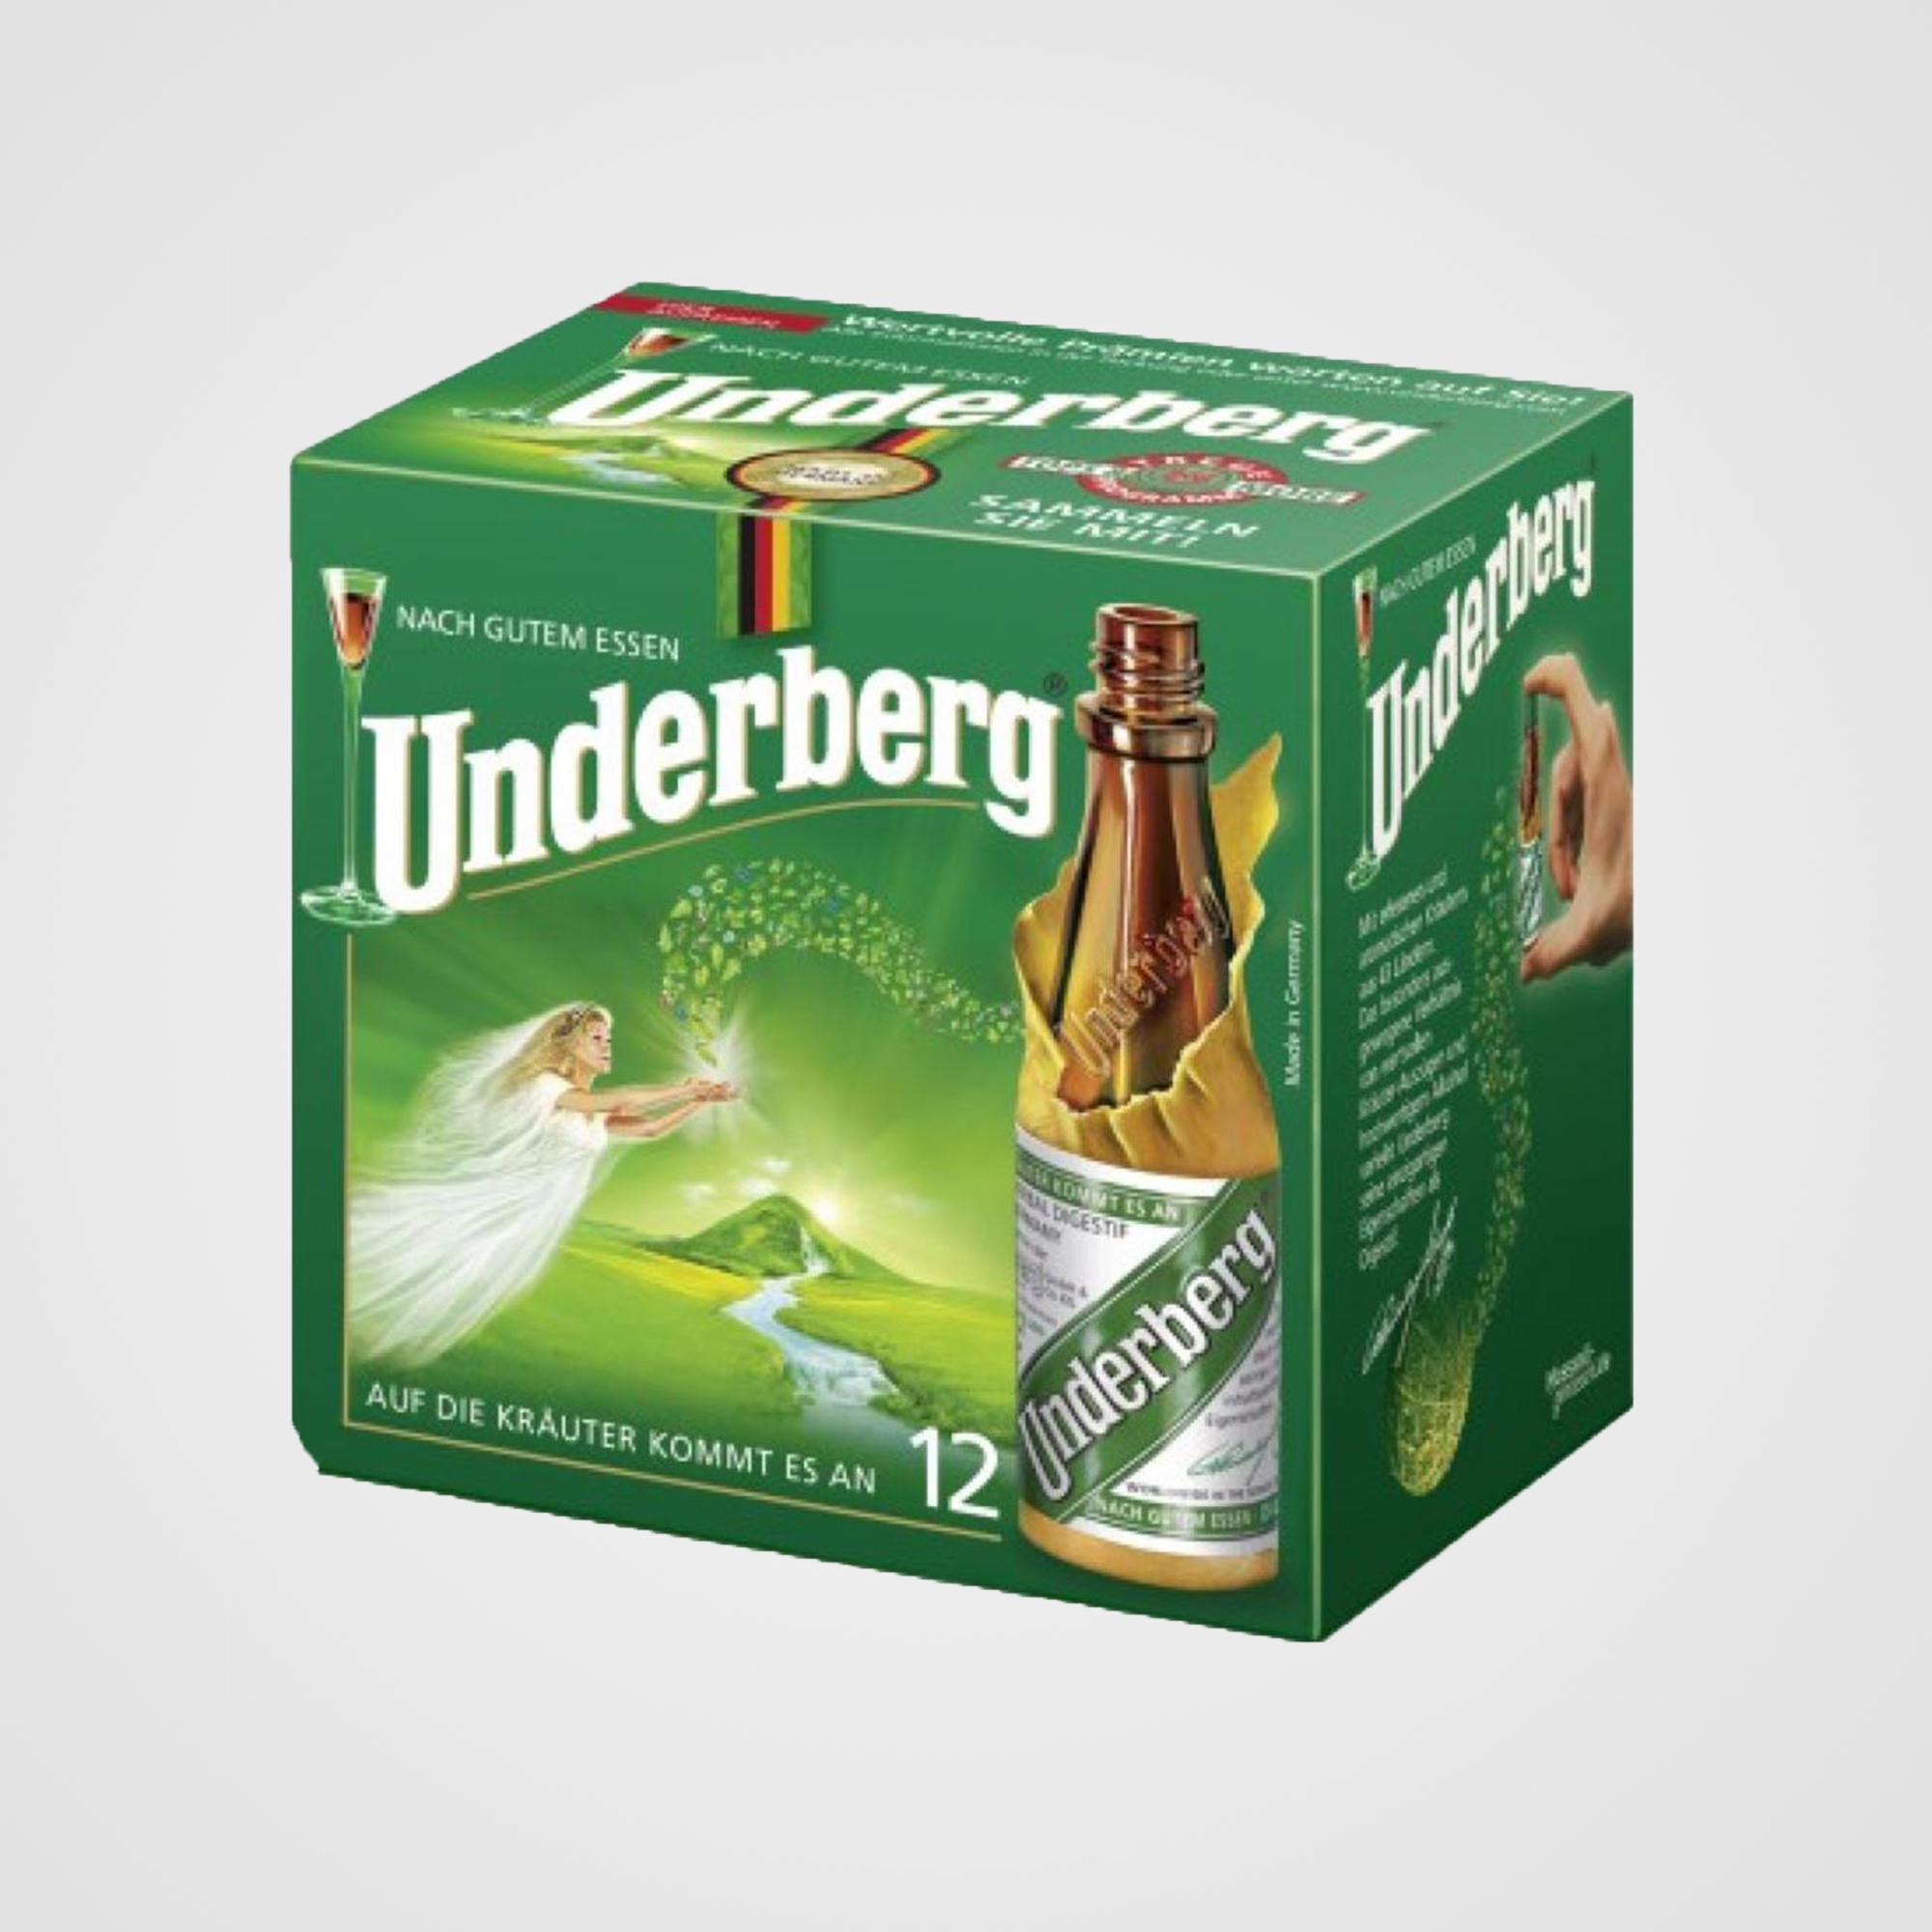 12 Bottle Pack - Underberg 12-Bottle Pack contains 12 portion size bottles of Underberg.Each Bottle is 20 ml. / 67 fl oz.Net Weight: 240 ml. / 8.04 fl oz.Country of Origin: Germany